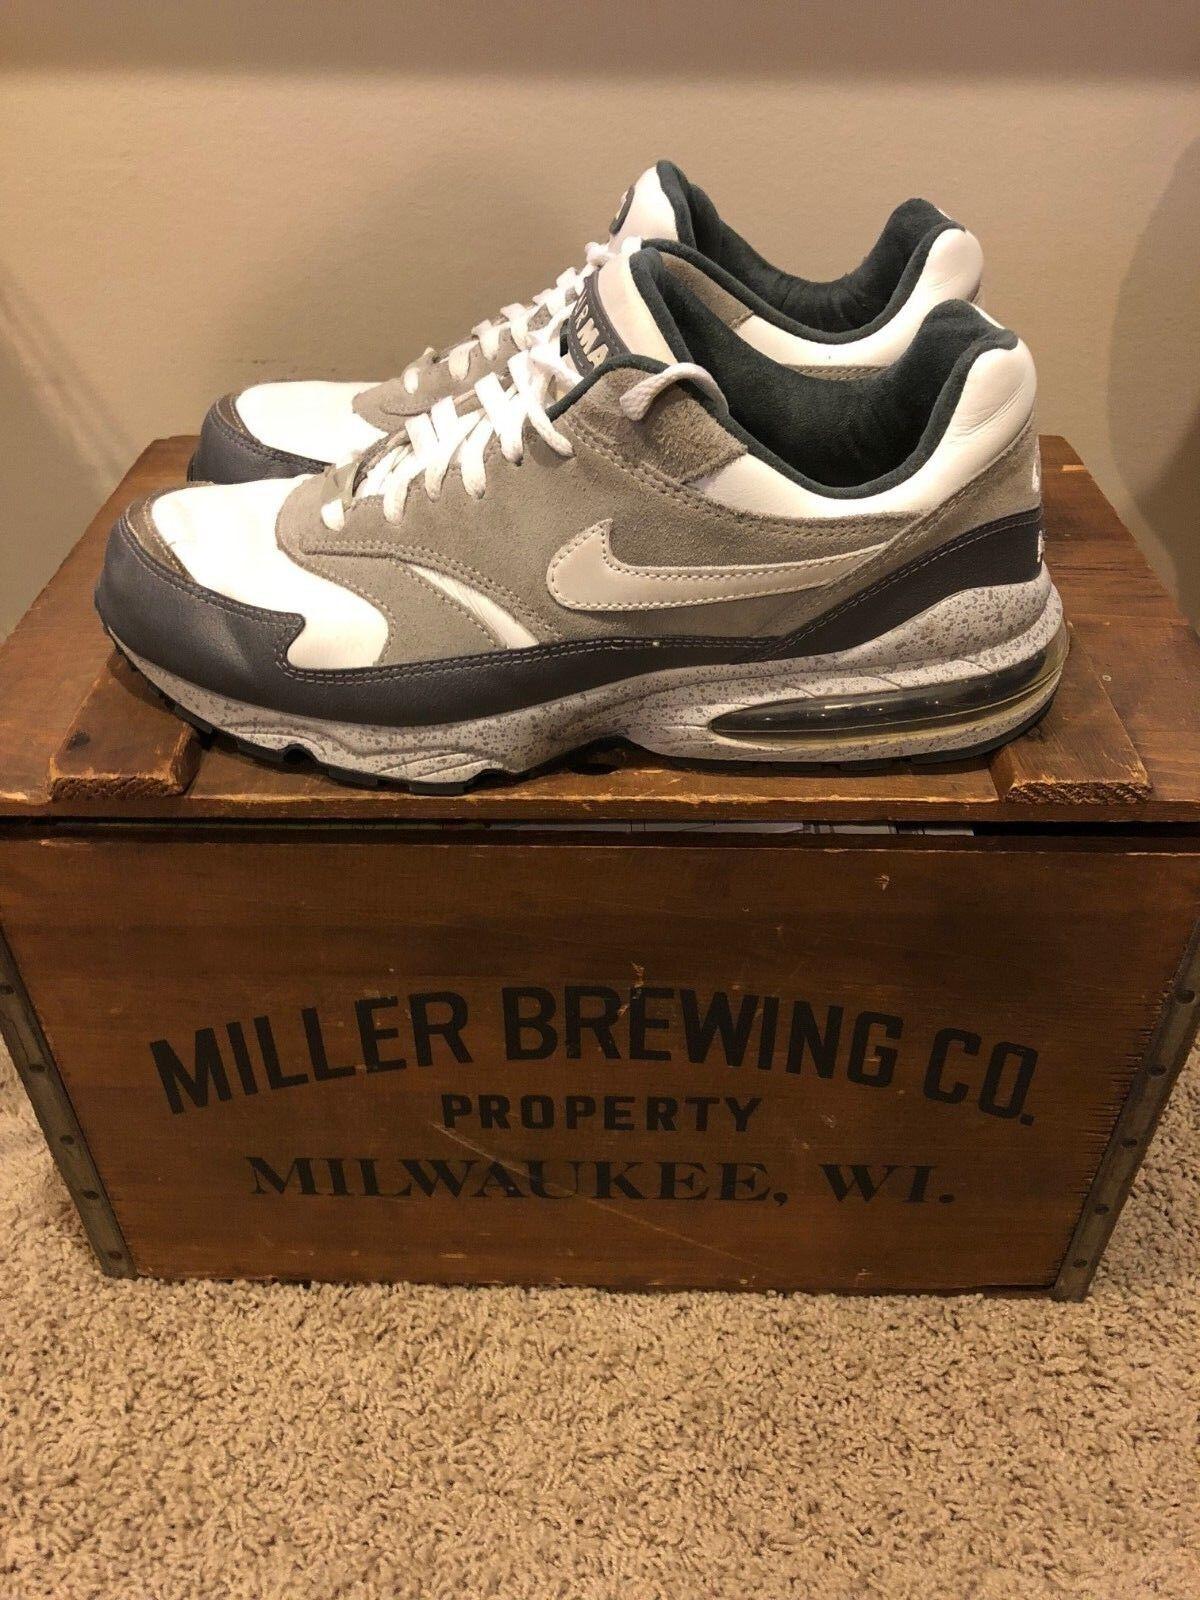 NIKE AIR MAX BURST Leather Grey White Graphite (305608-011) US 8 —BRAND NEW